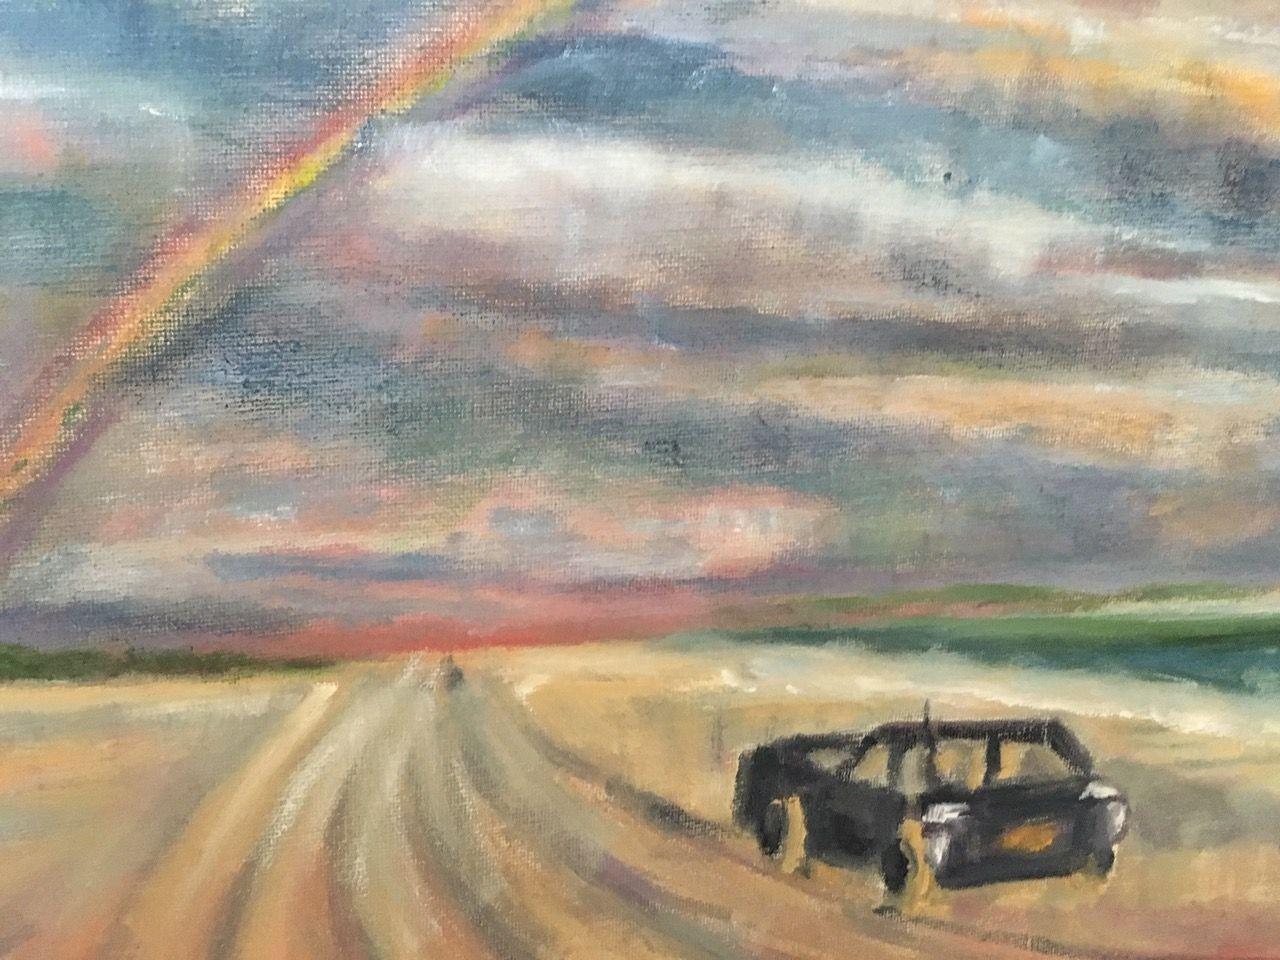 Artist: Janet Fink, Oil on Canvas